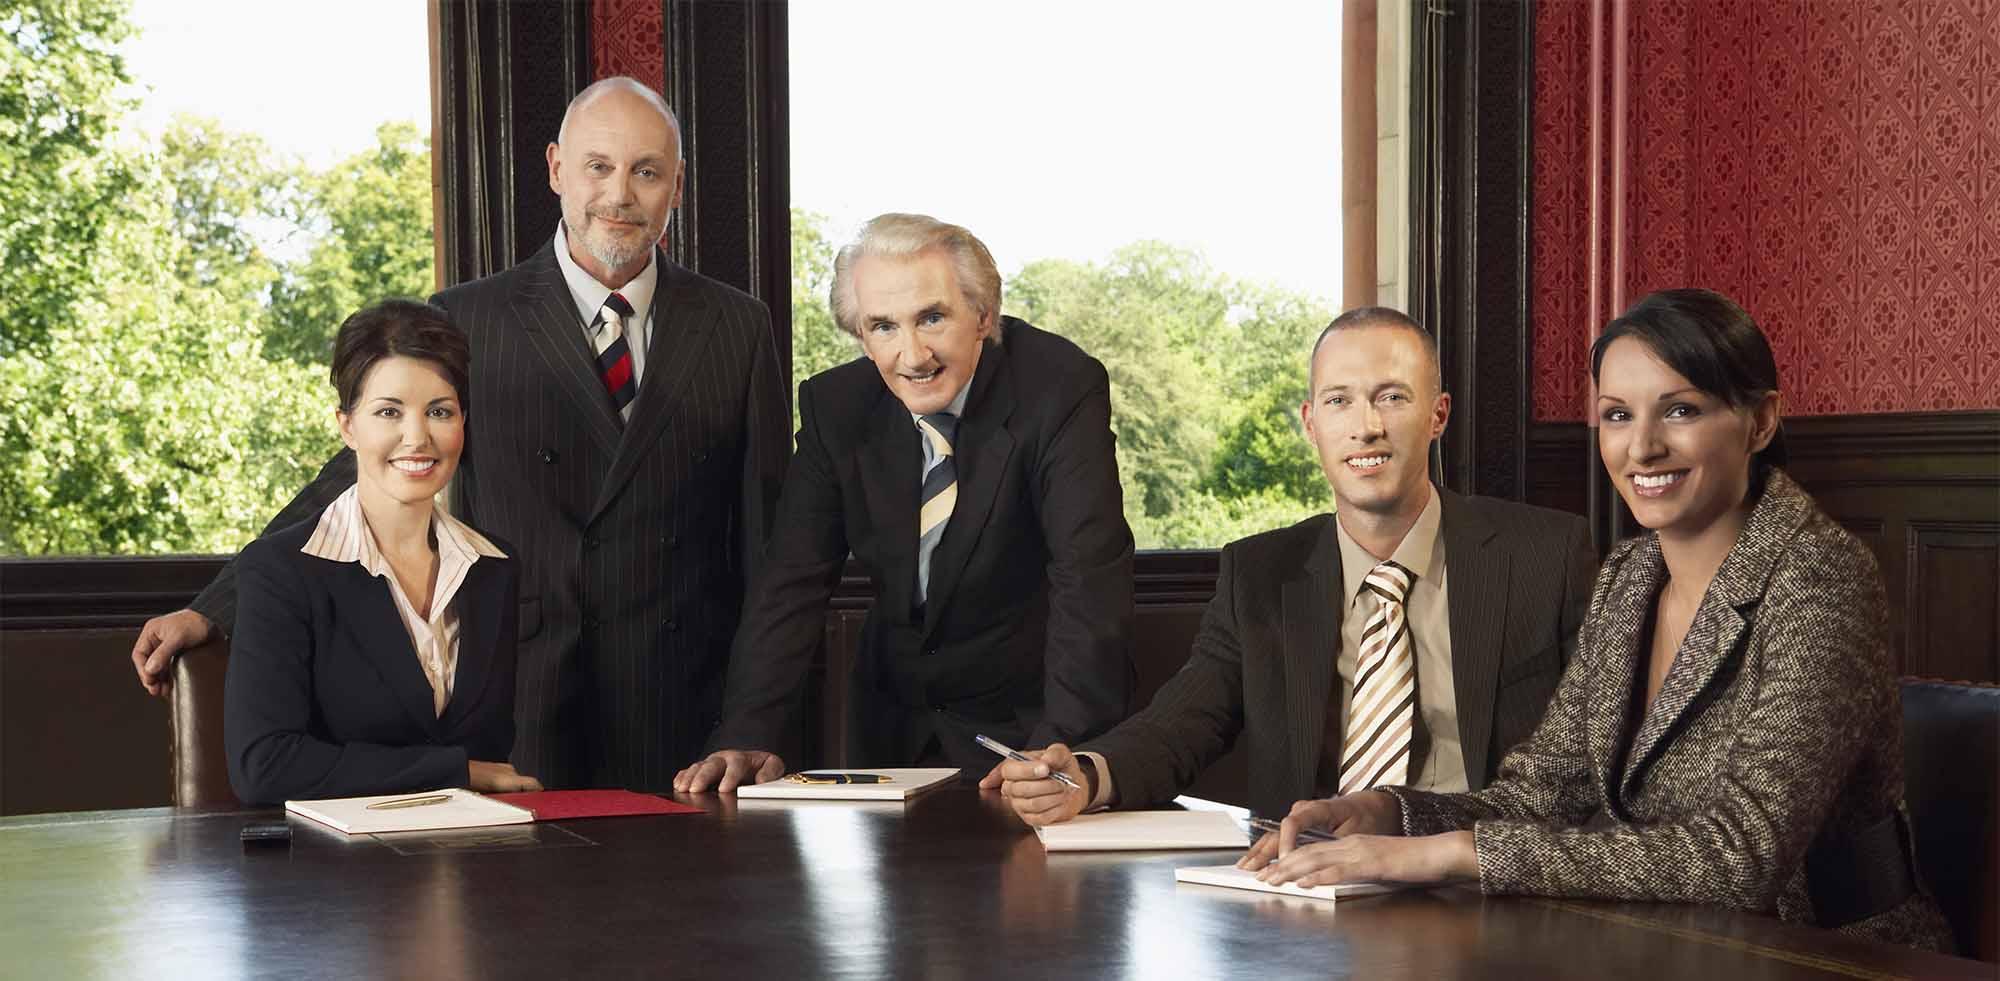 Cabinet d'avocat Hammonds